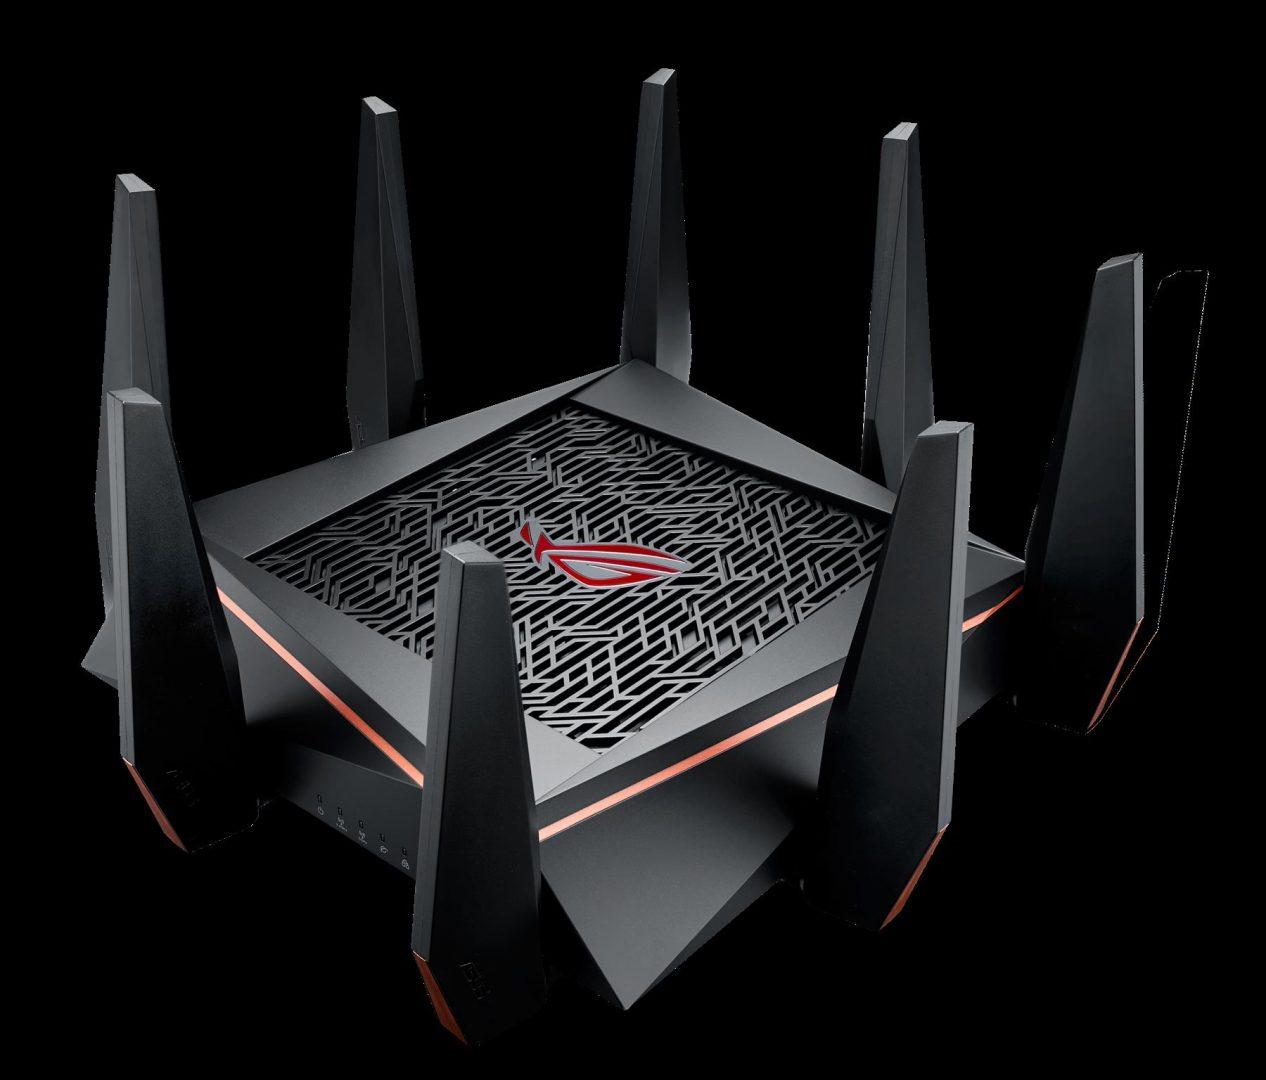 ROG Rapture GT-AC5300-Router-3D-2